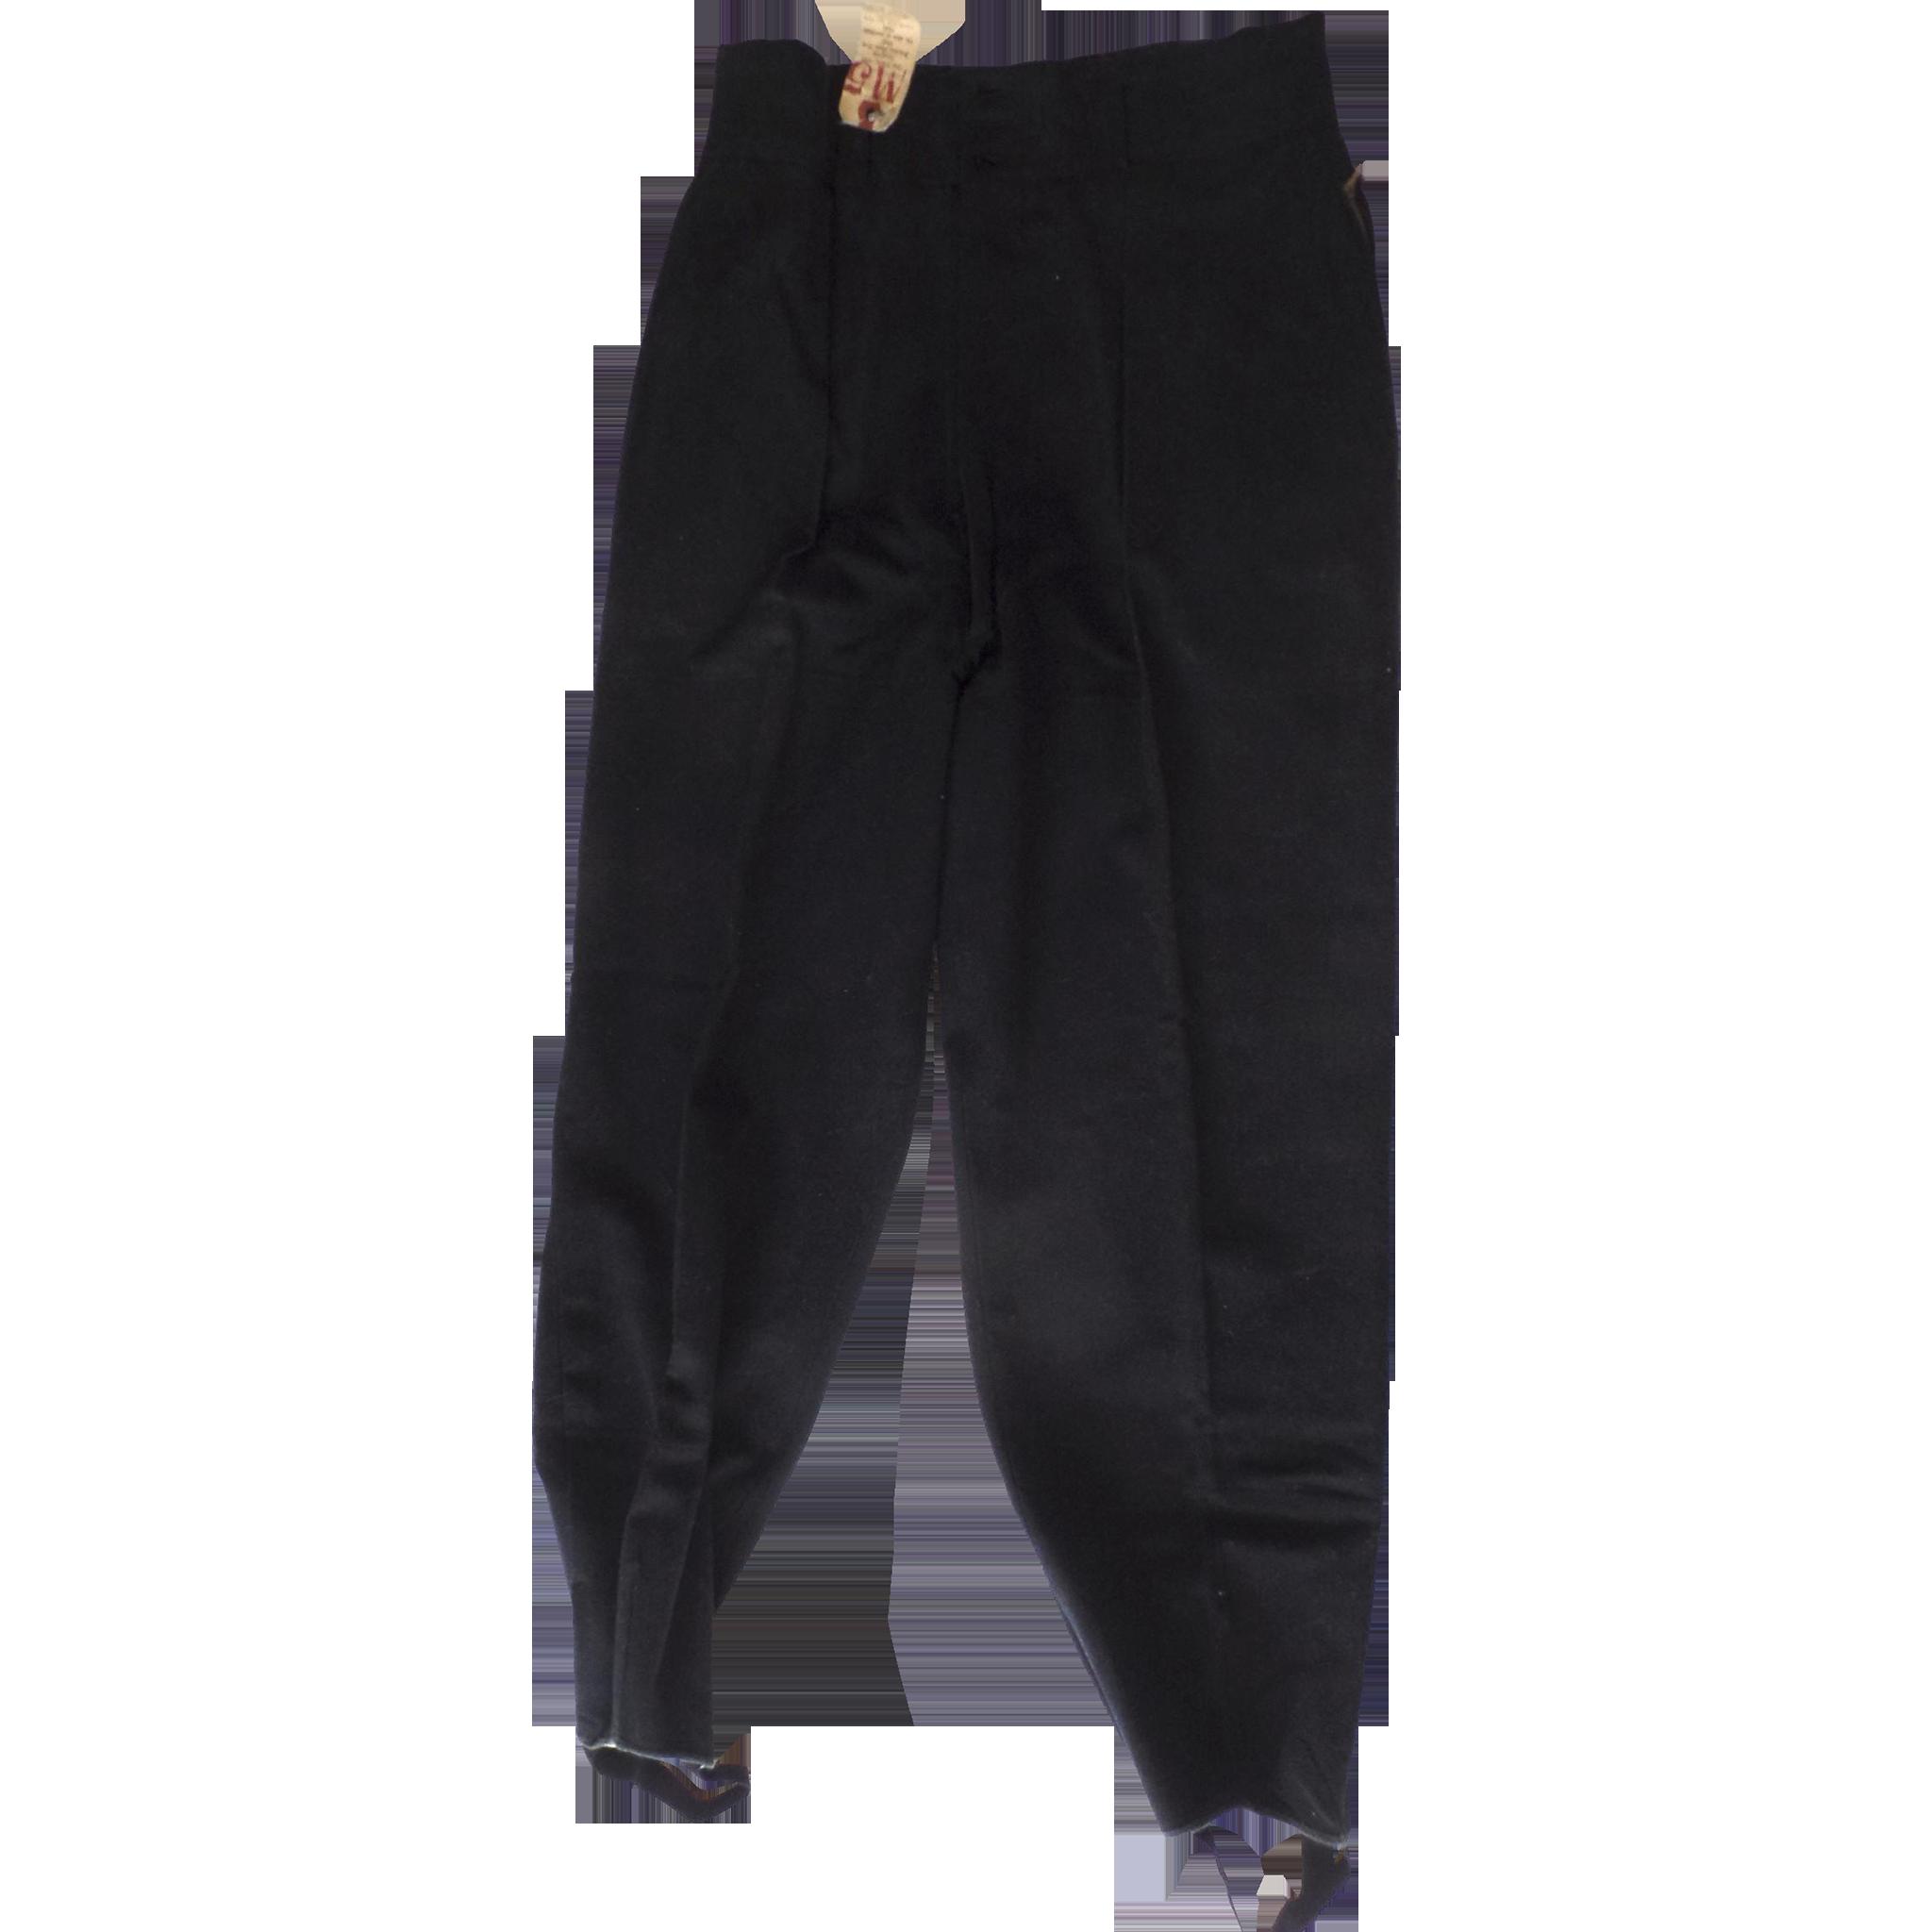 Vintage Men S 100 Wool Navy Ski Pants Stirrup 1950 S With